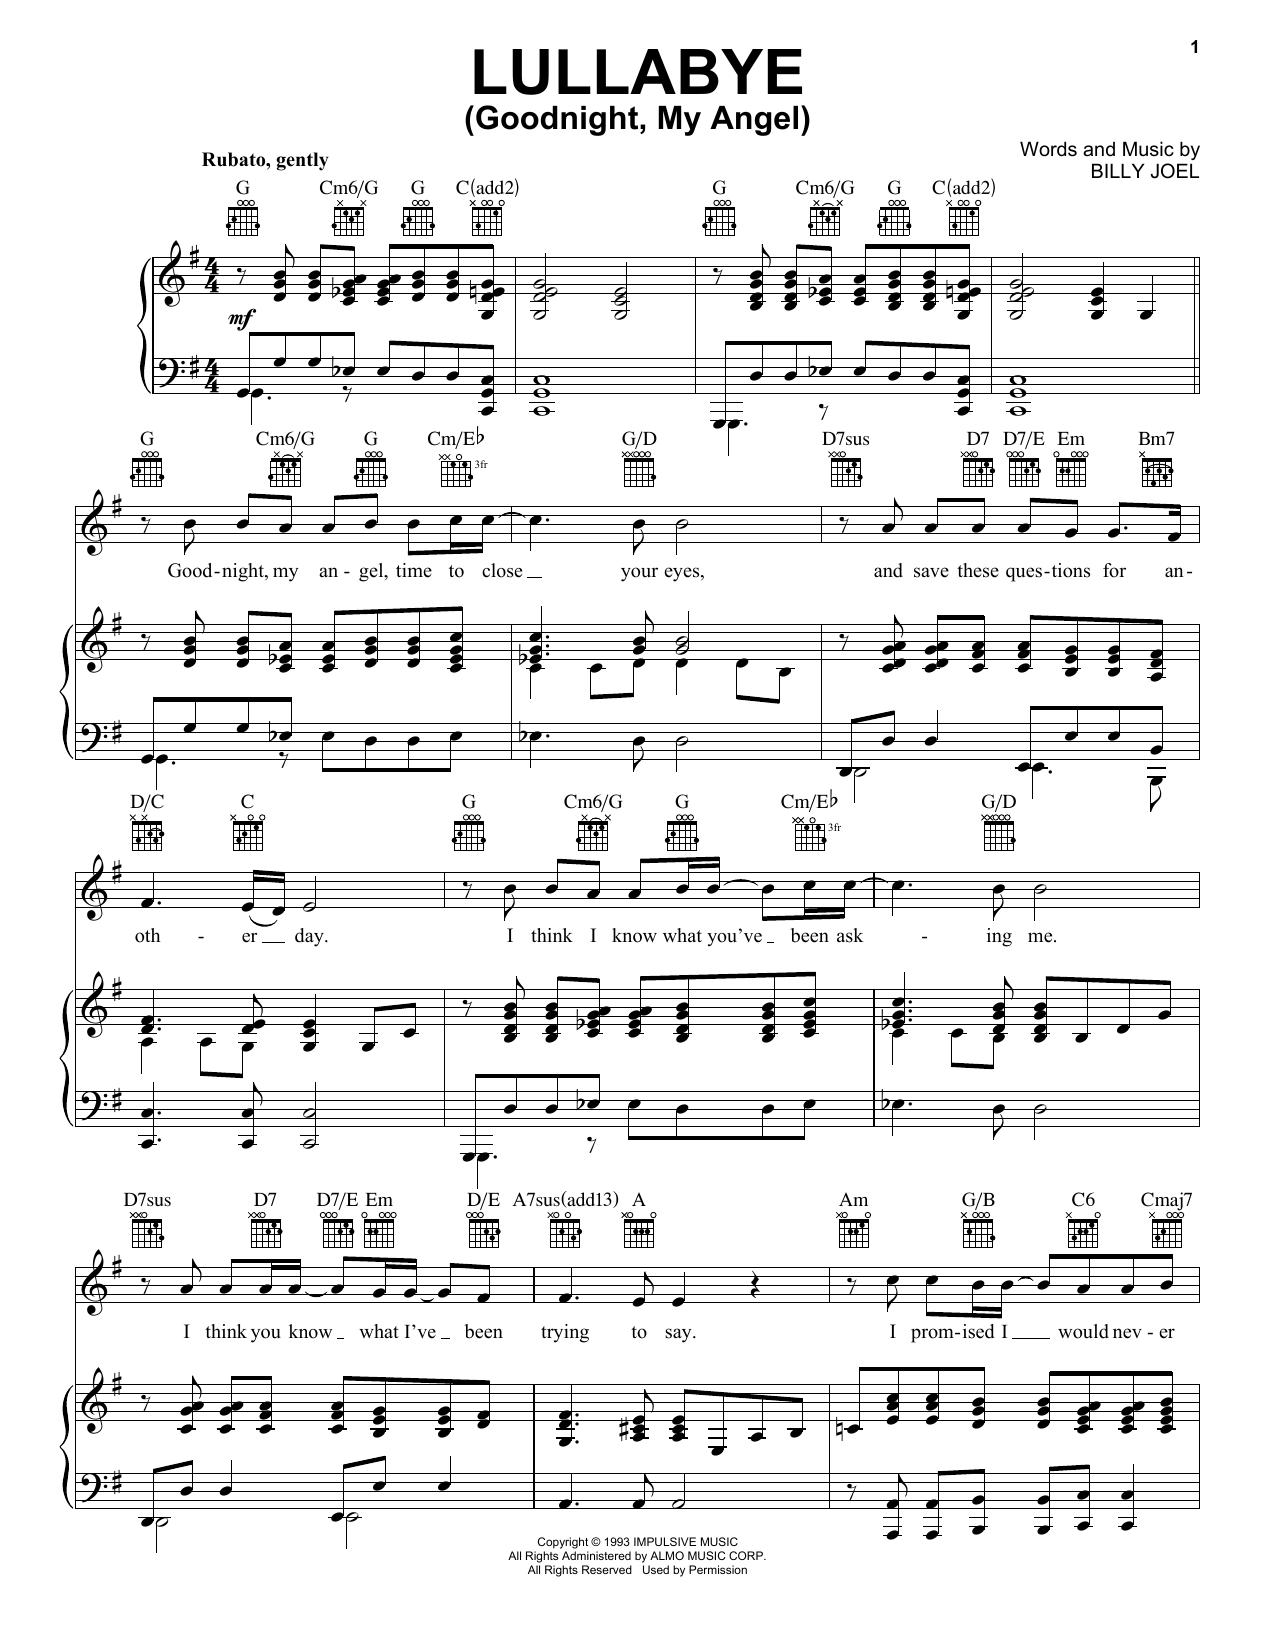 Billy Joel Lullaby Sheet Music : billy, lullaby, sheet, music, Lullabye, (Goodnight,, Angel), Sheet, Music, Billy, Piano/Keyboard, Voice, Noteflight, Marketplace